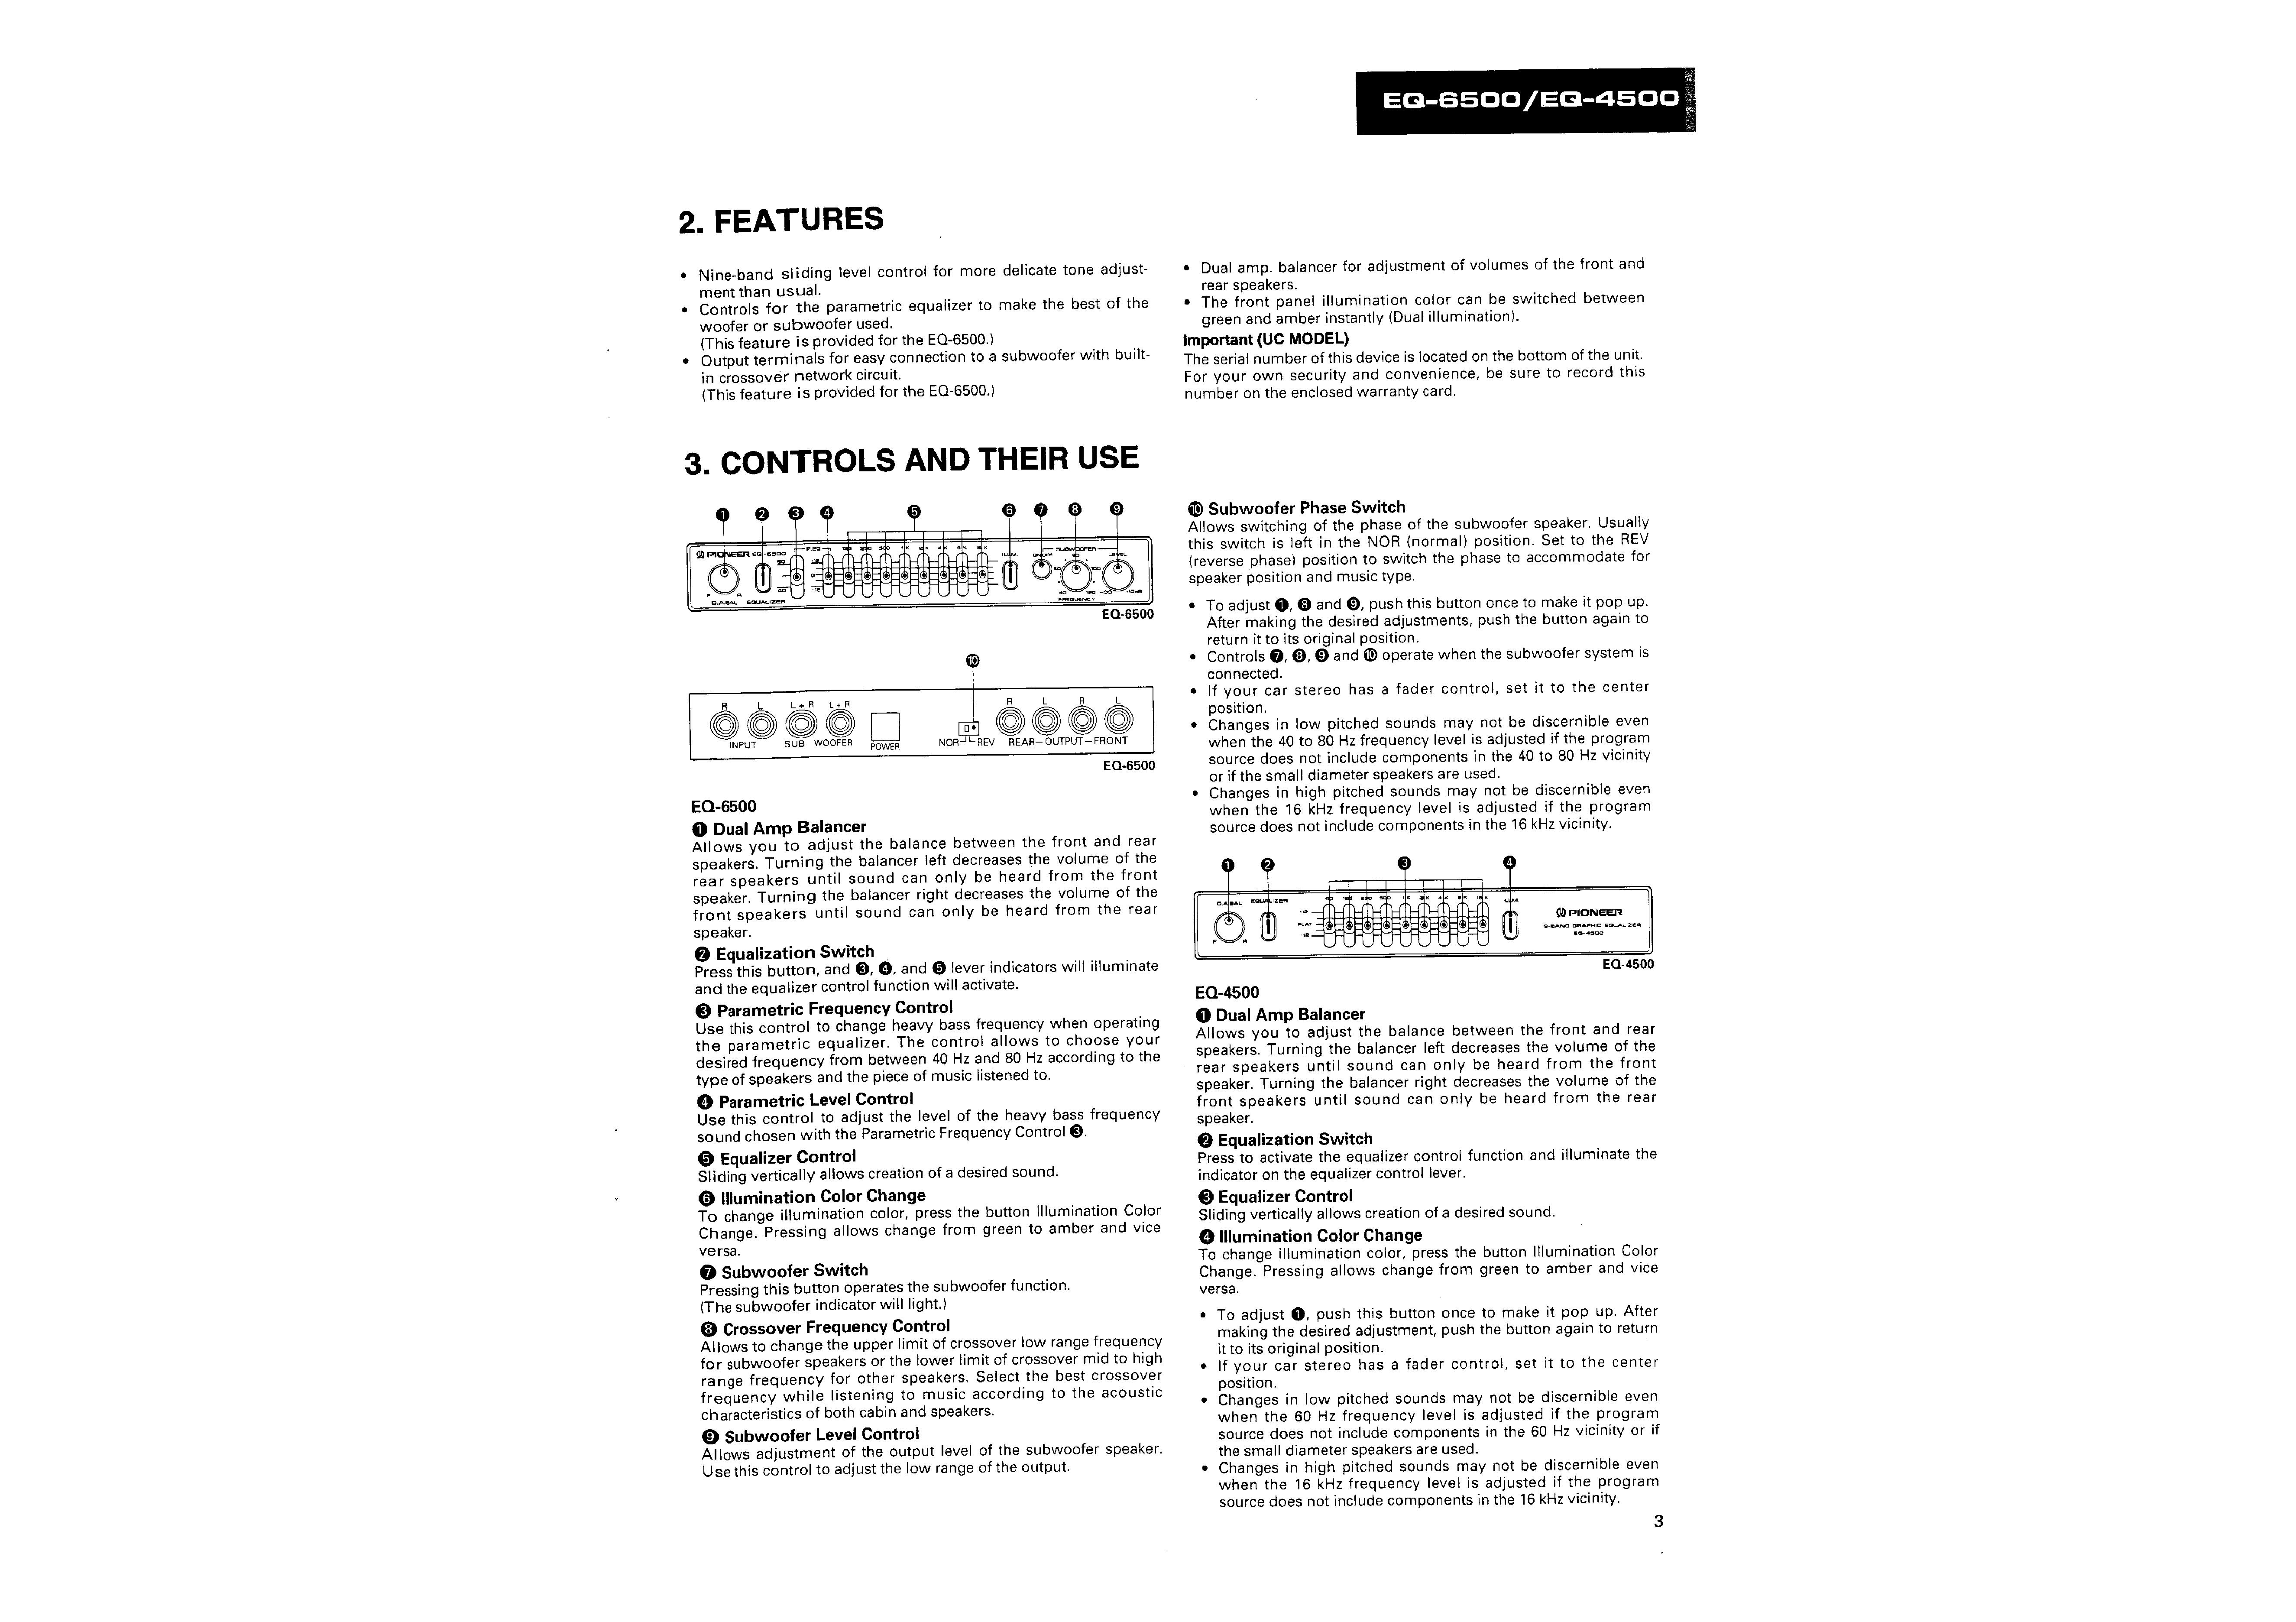 [DIAGRAM_38DE]  MN_8043] Pioneer Eq 6500 Wiring Diagram Free Diagram   Wiring Diagram Pioneer Eq 4500      Knie Rdona Benol Eatte Mohammedshrine Librar Wiring 101